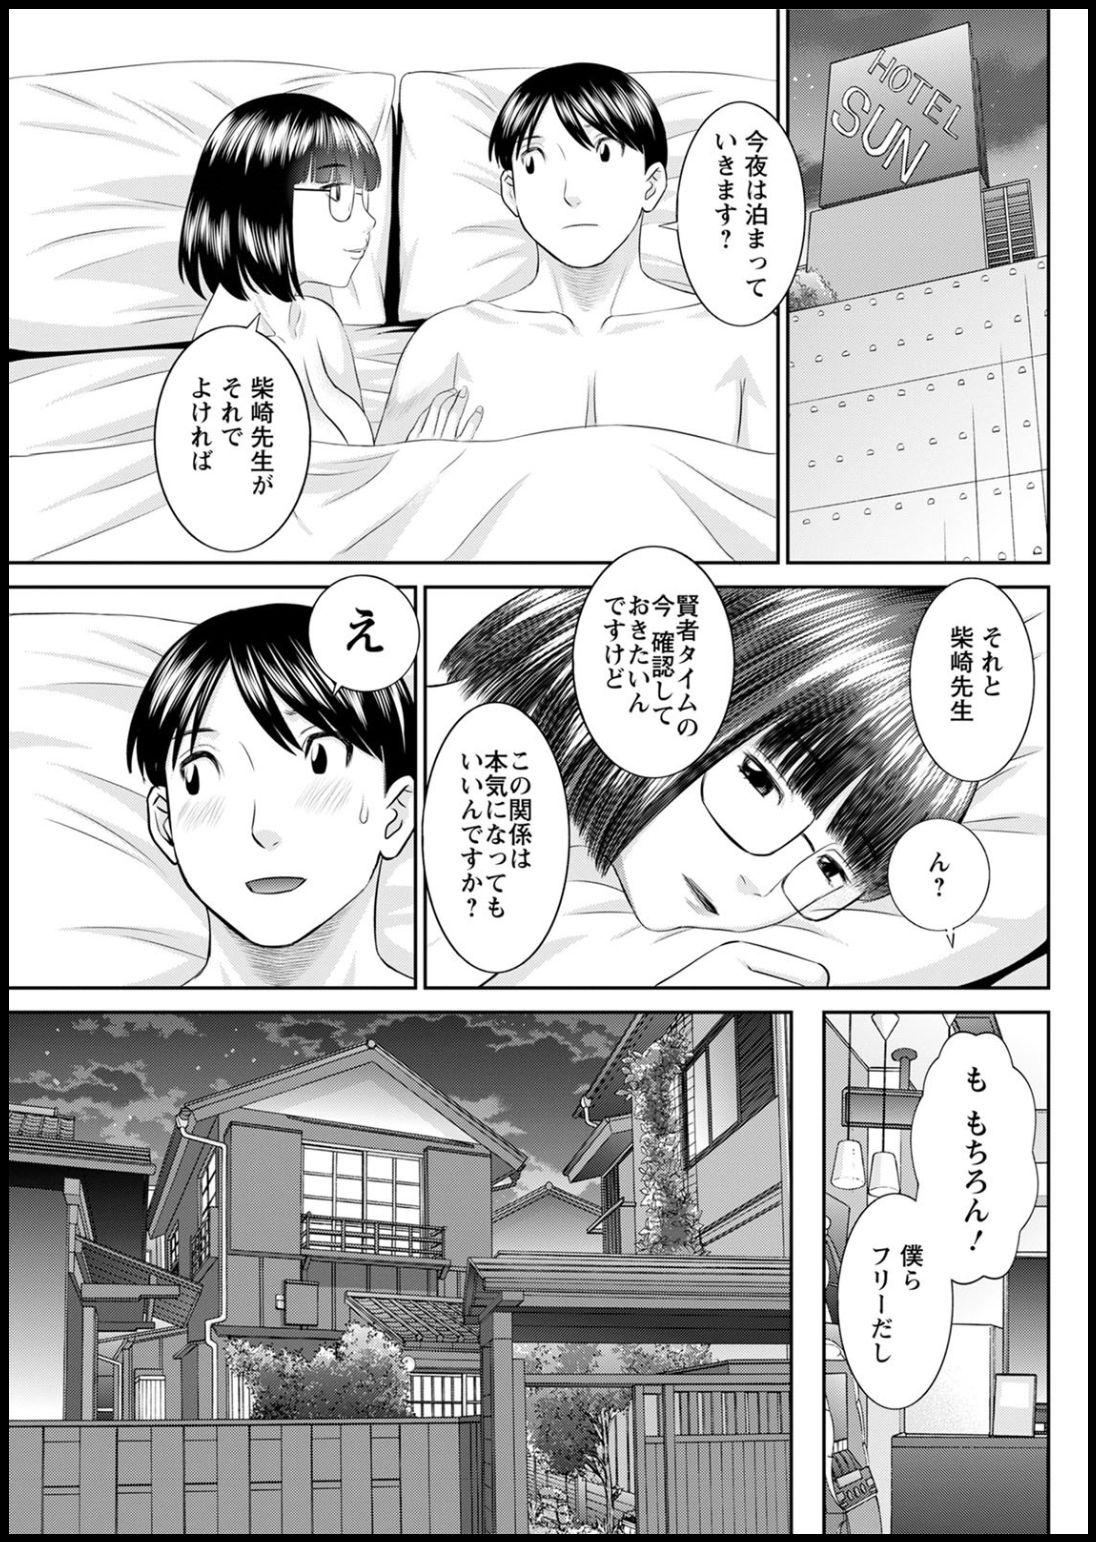 [Kawamori Misaki] Kaikan Hitotsuma Gakuen Ch. 1-6, 8-20 [Digital] 293